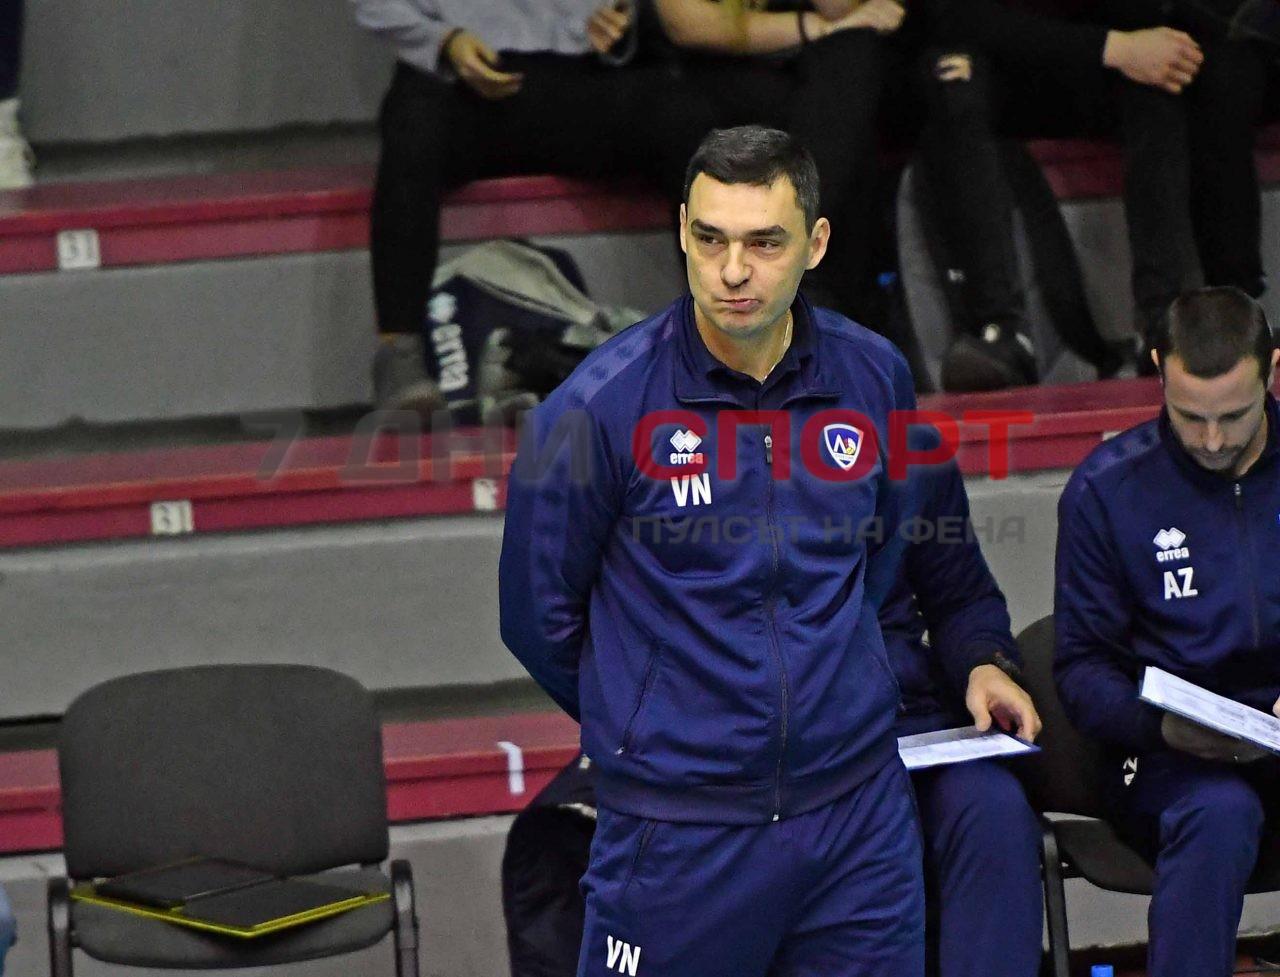 Левски-Лукойл-нефтохимик-волейбол-мъже-3-1280x977.jpg